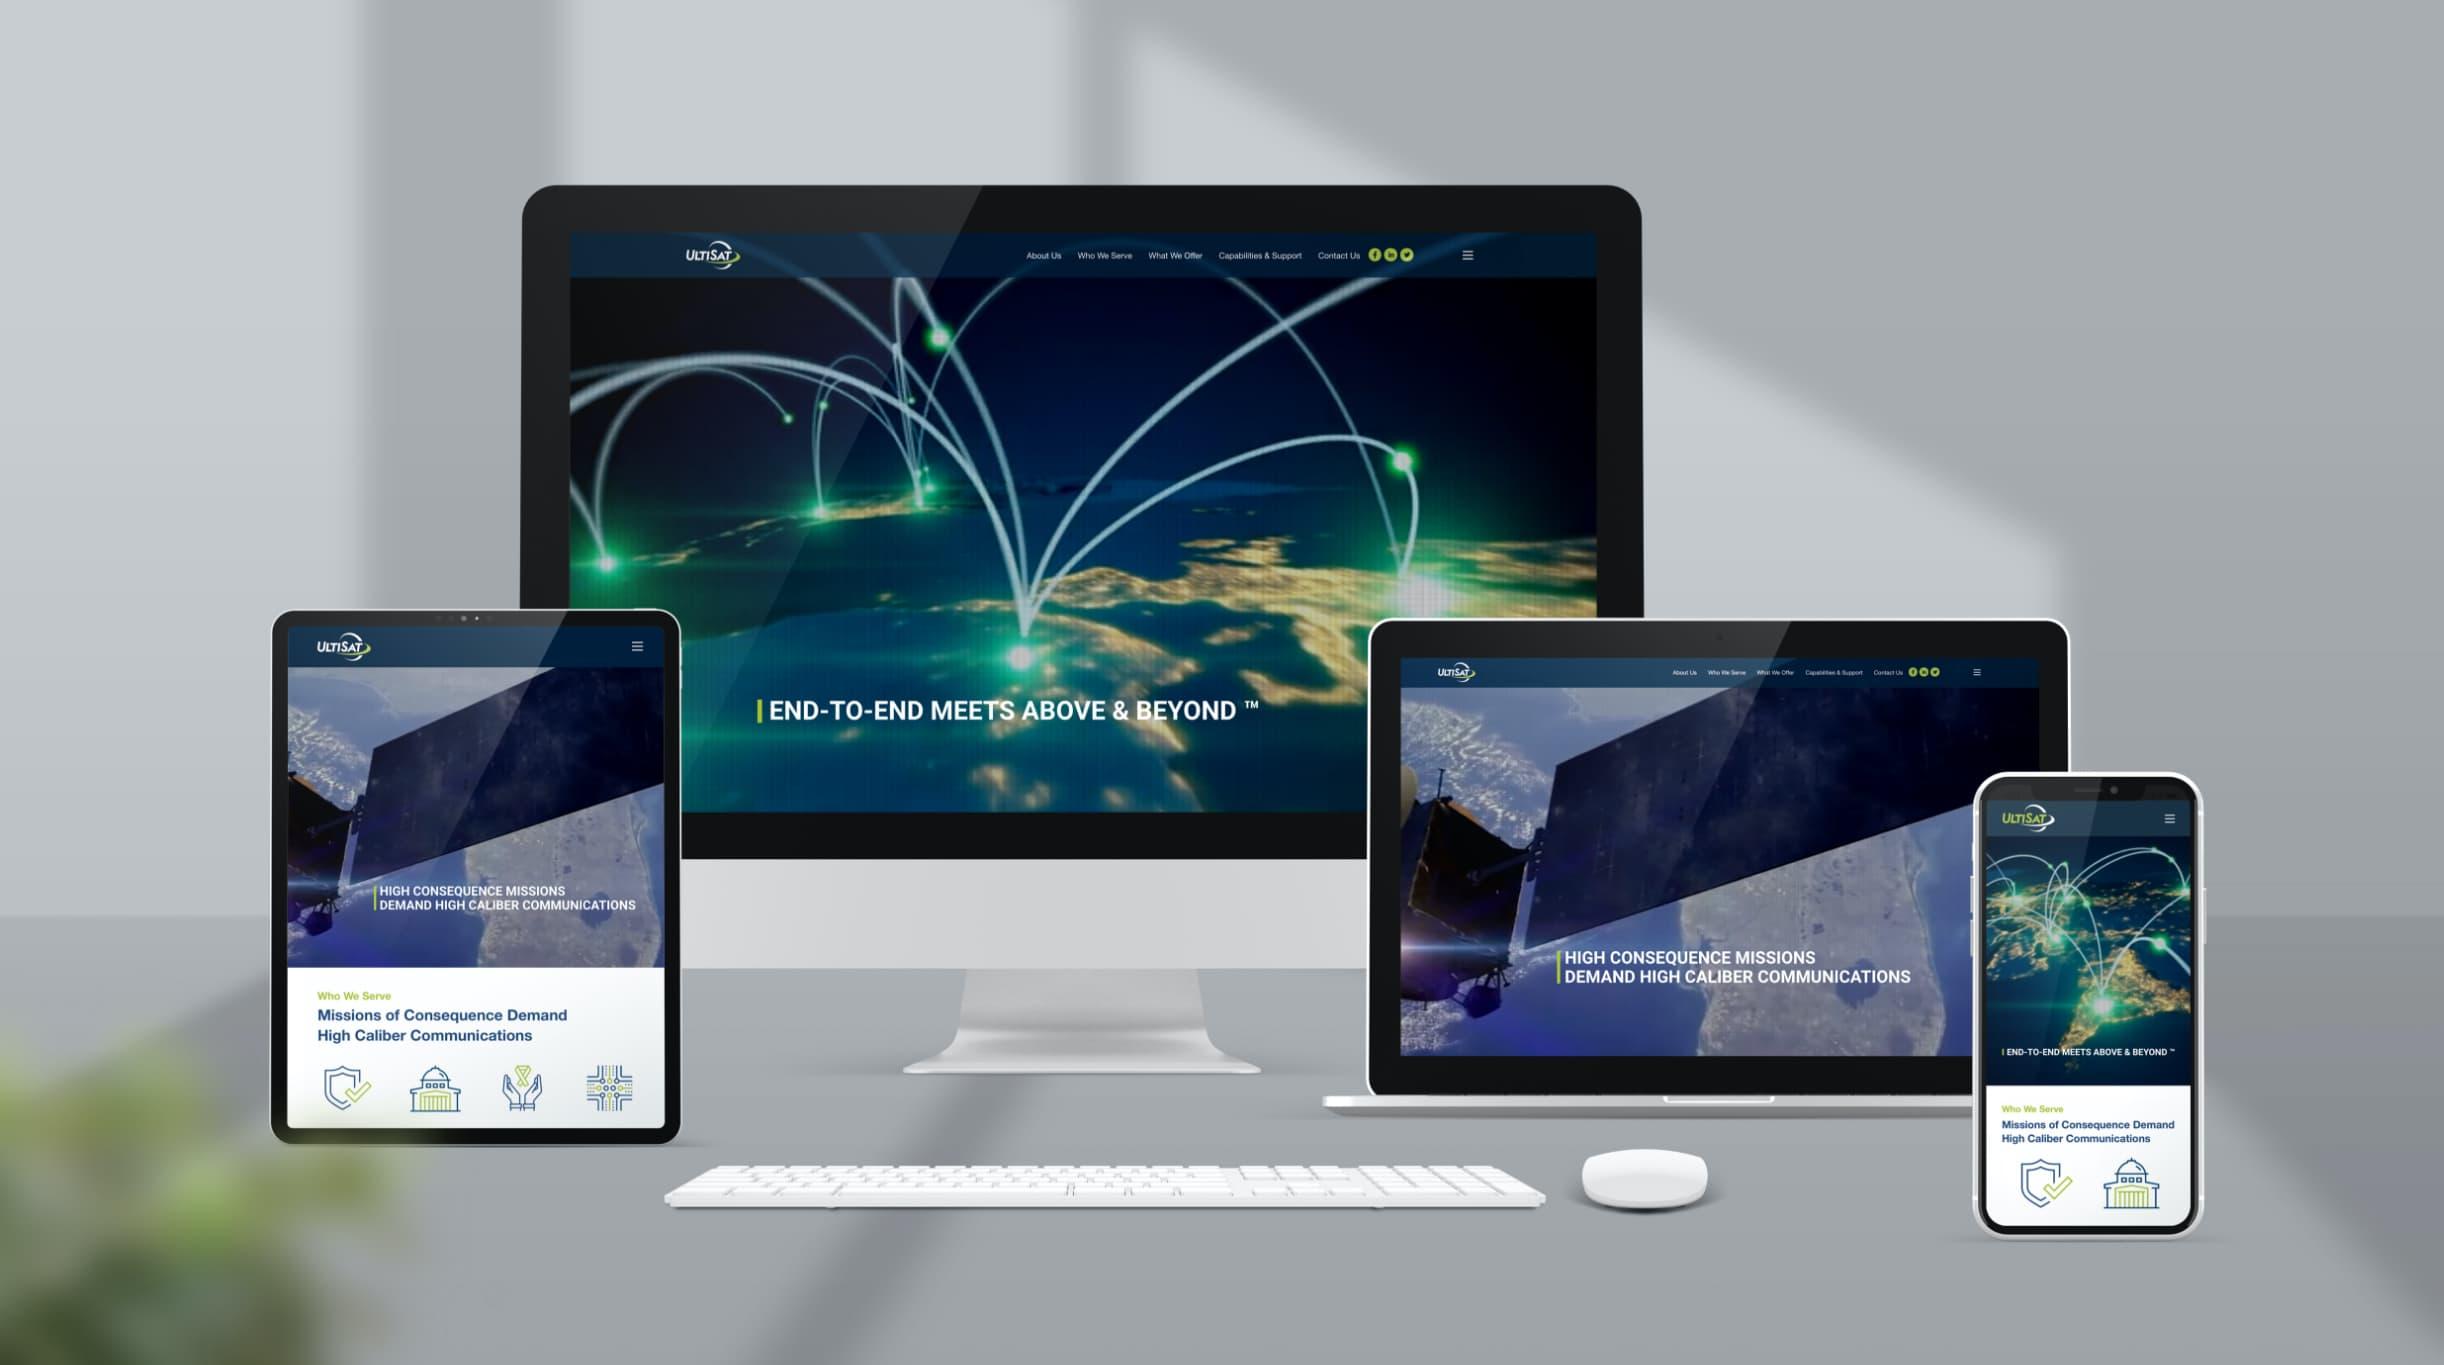 UltiSat website design and development using WordPress